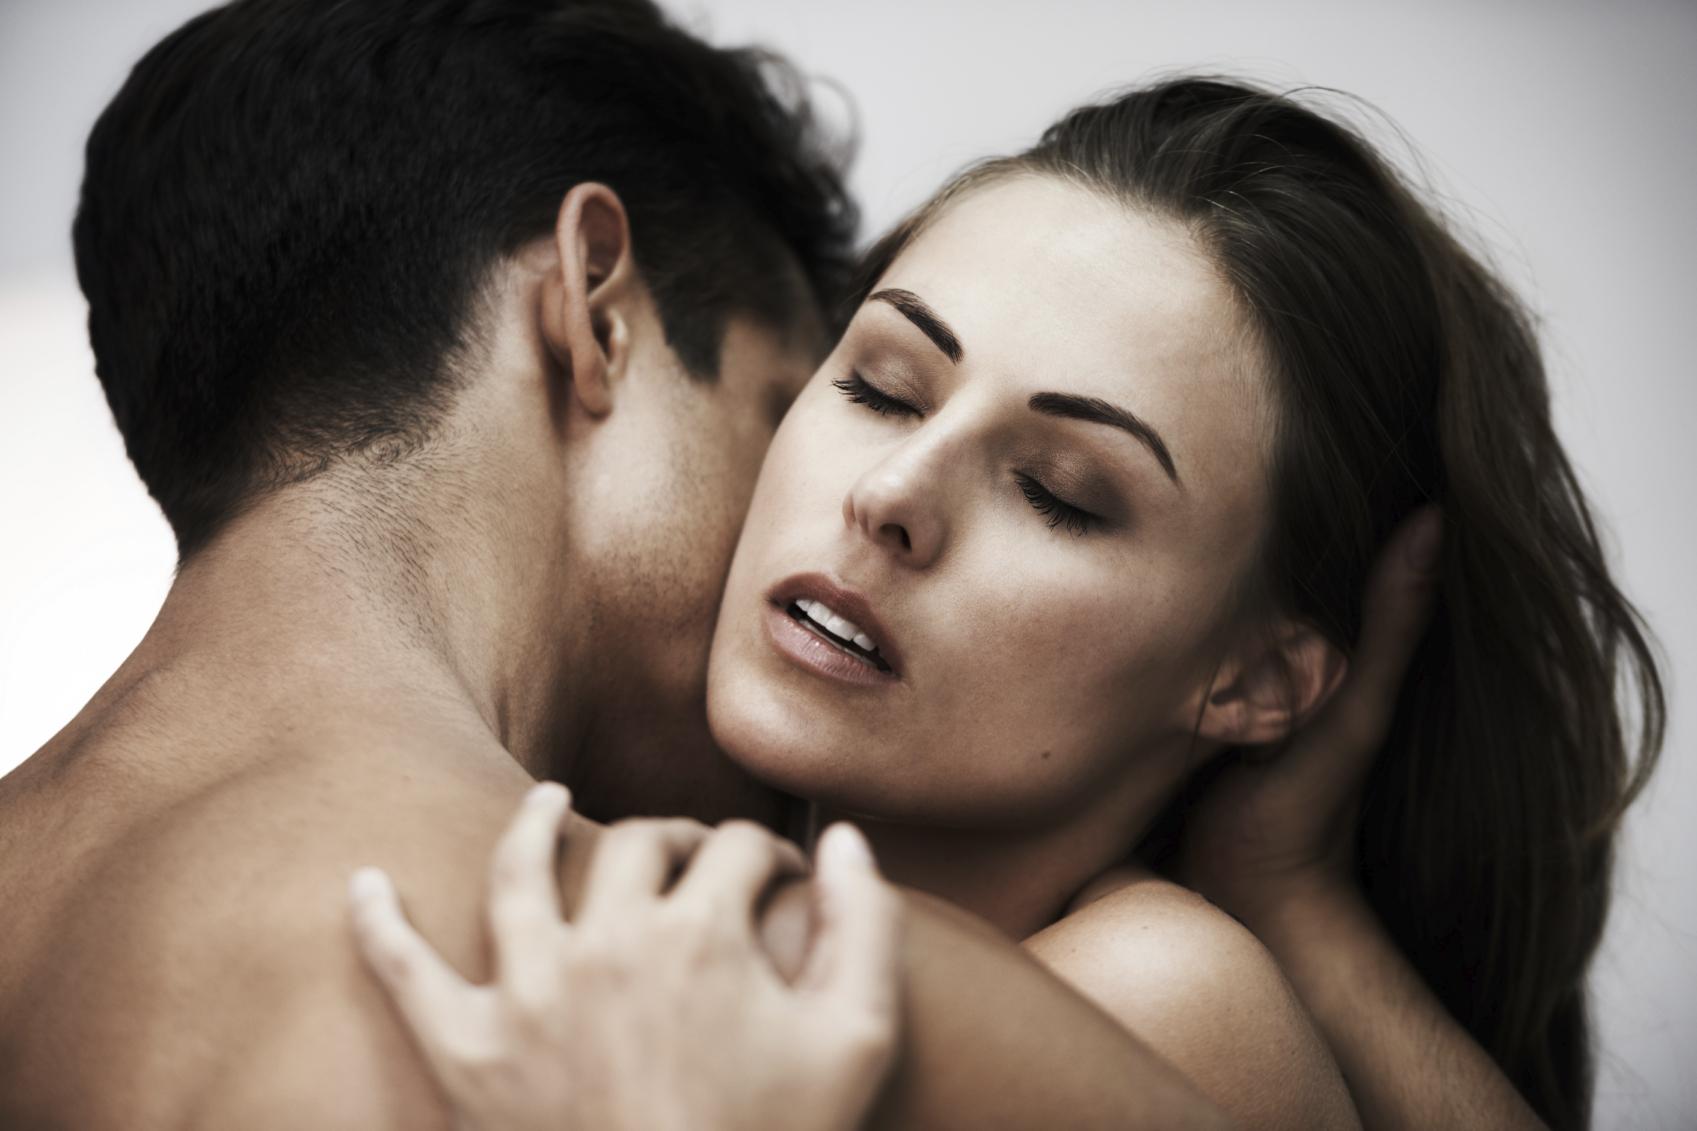 sexhistorier godnathistorie sexet udsalg